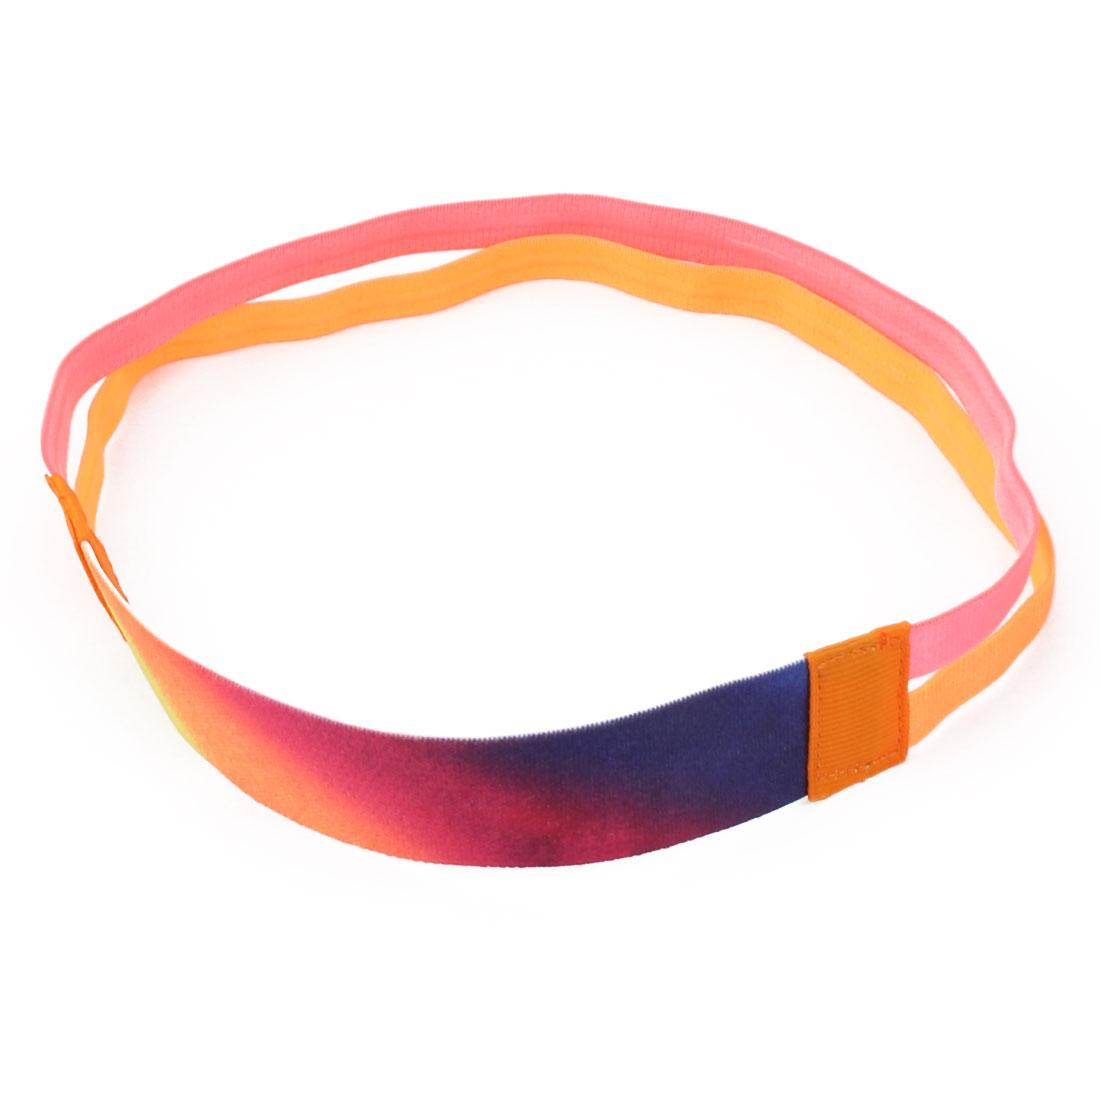 Traning Silicone Double Line Design Non-slip Sports Headband Pink Orange